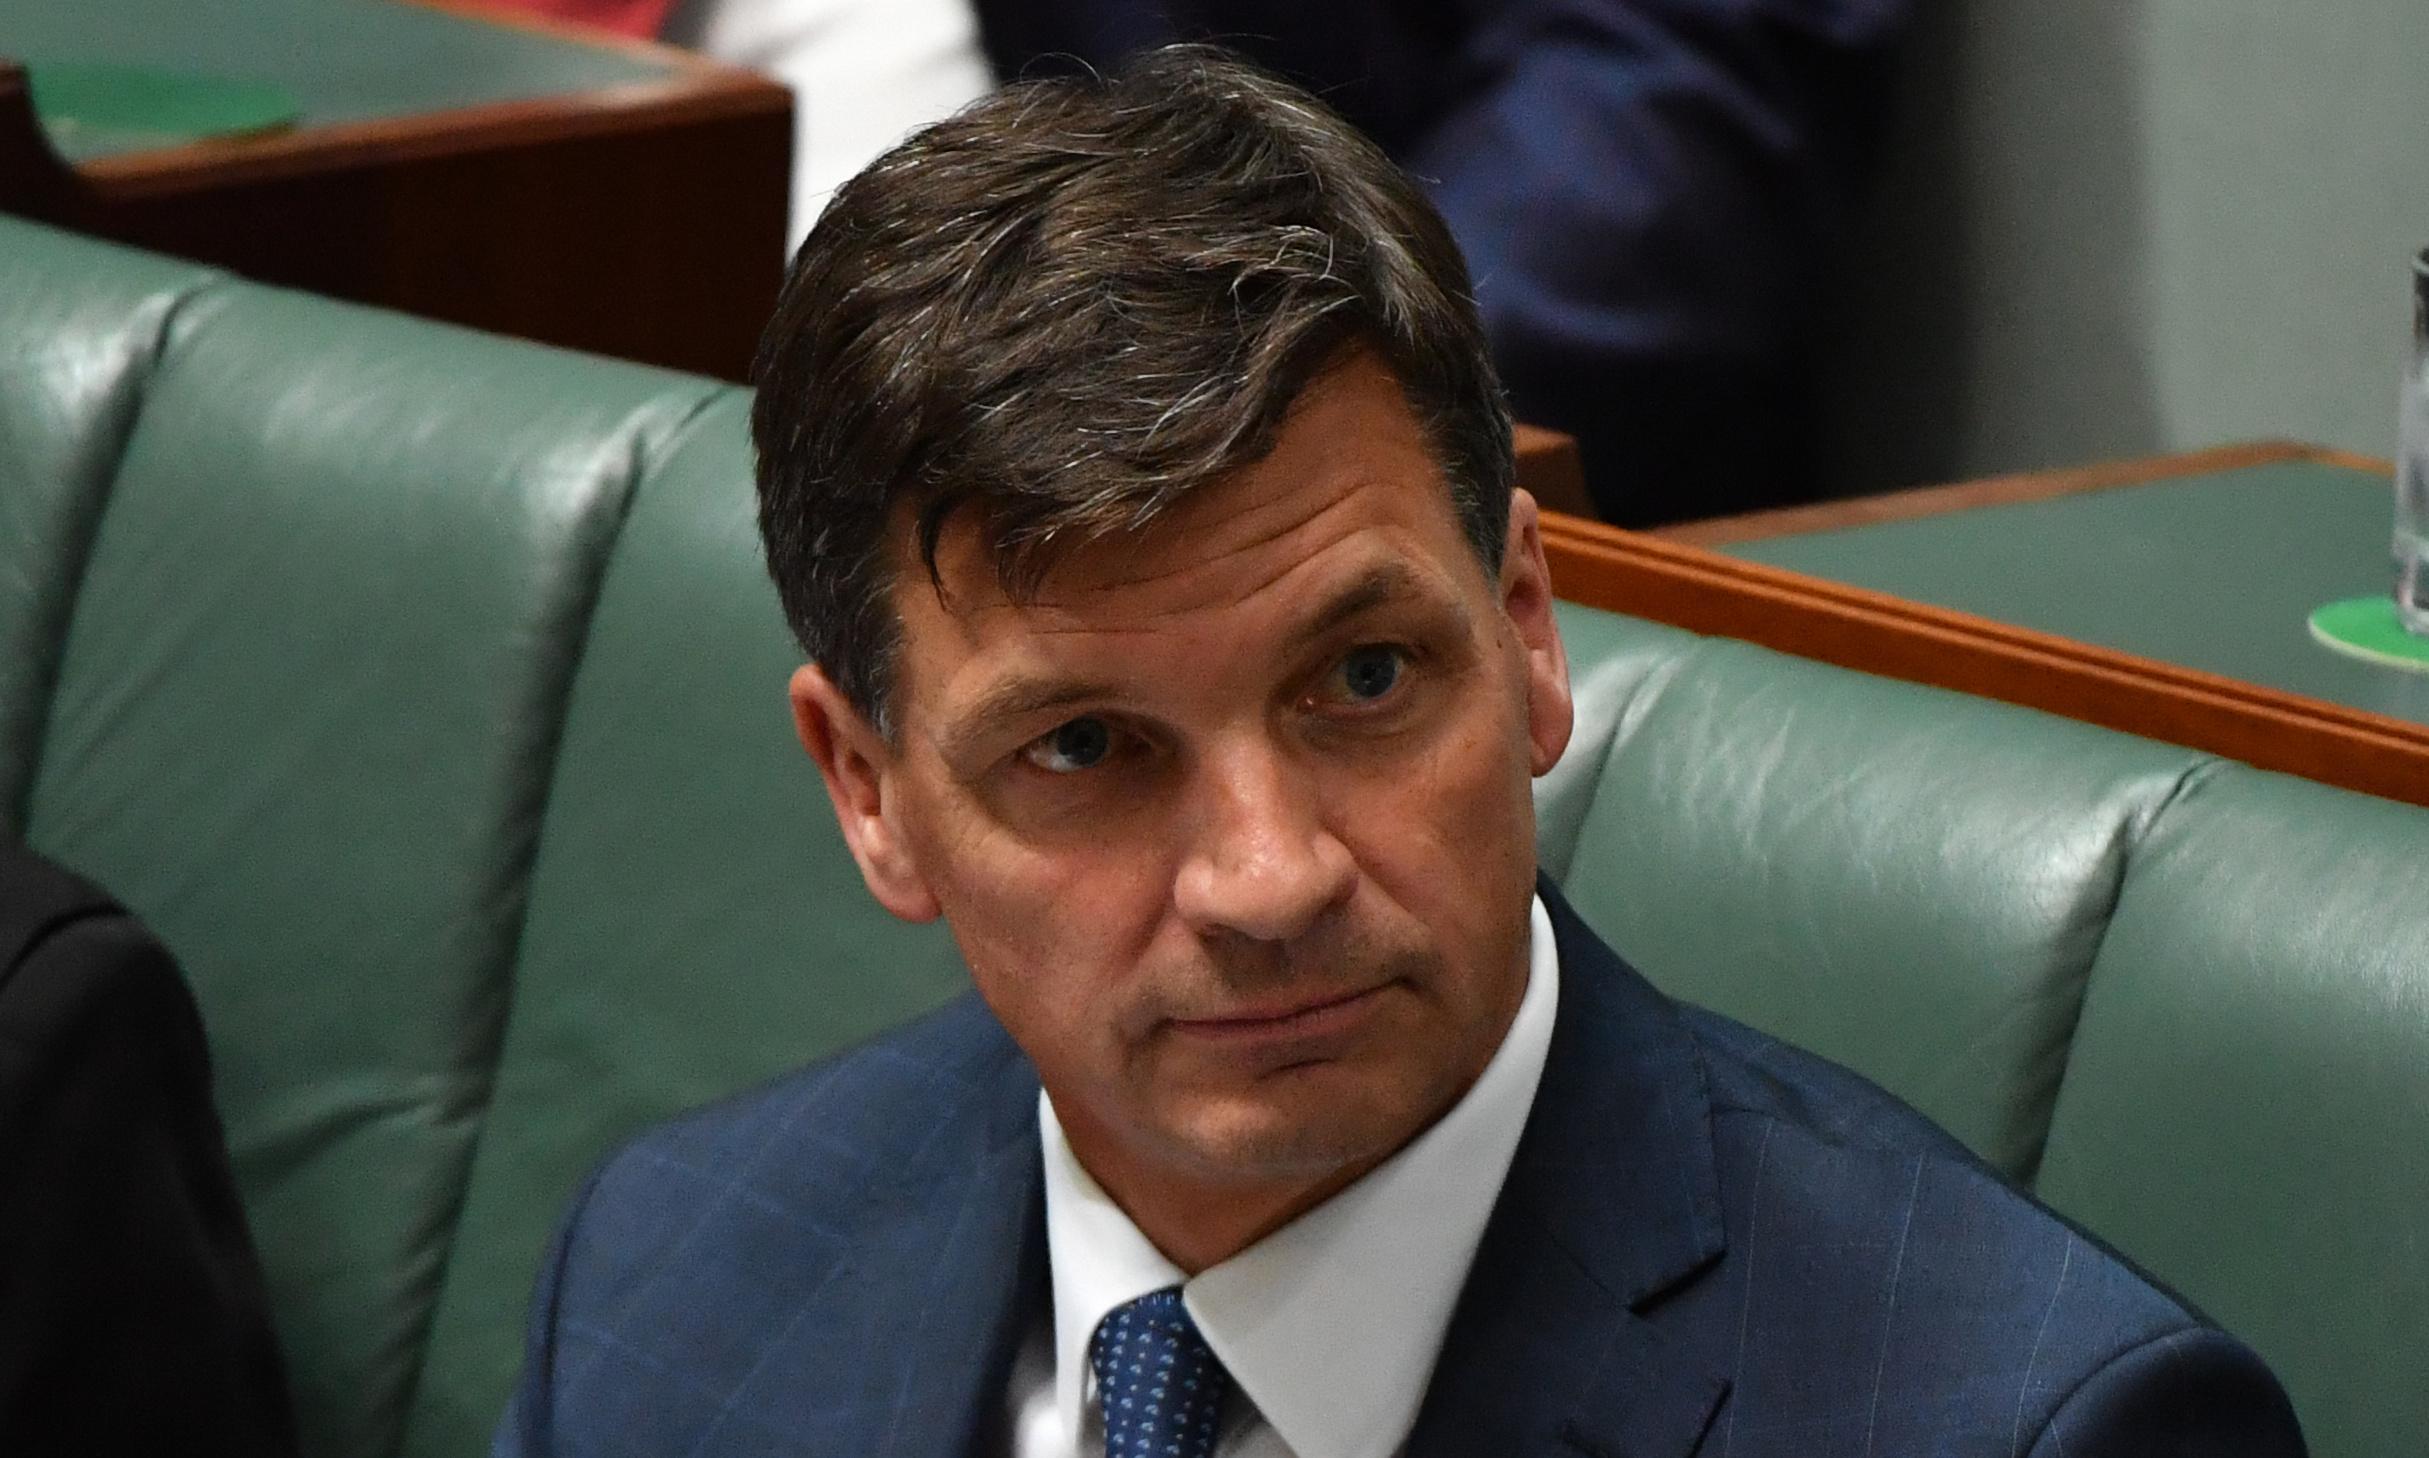 Senators call for Angus Taylor inquiry over 'clear breaches' in grasslands saga